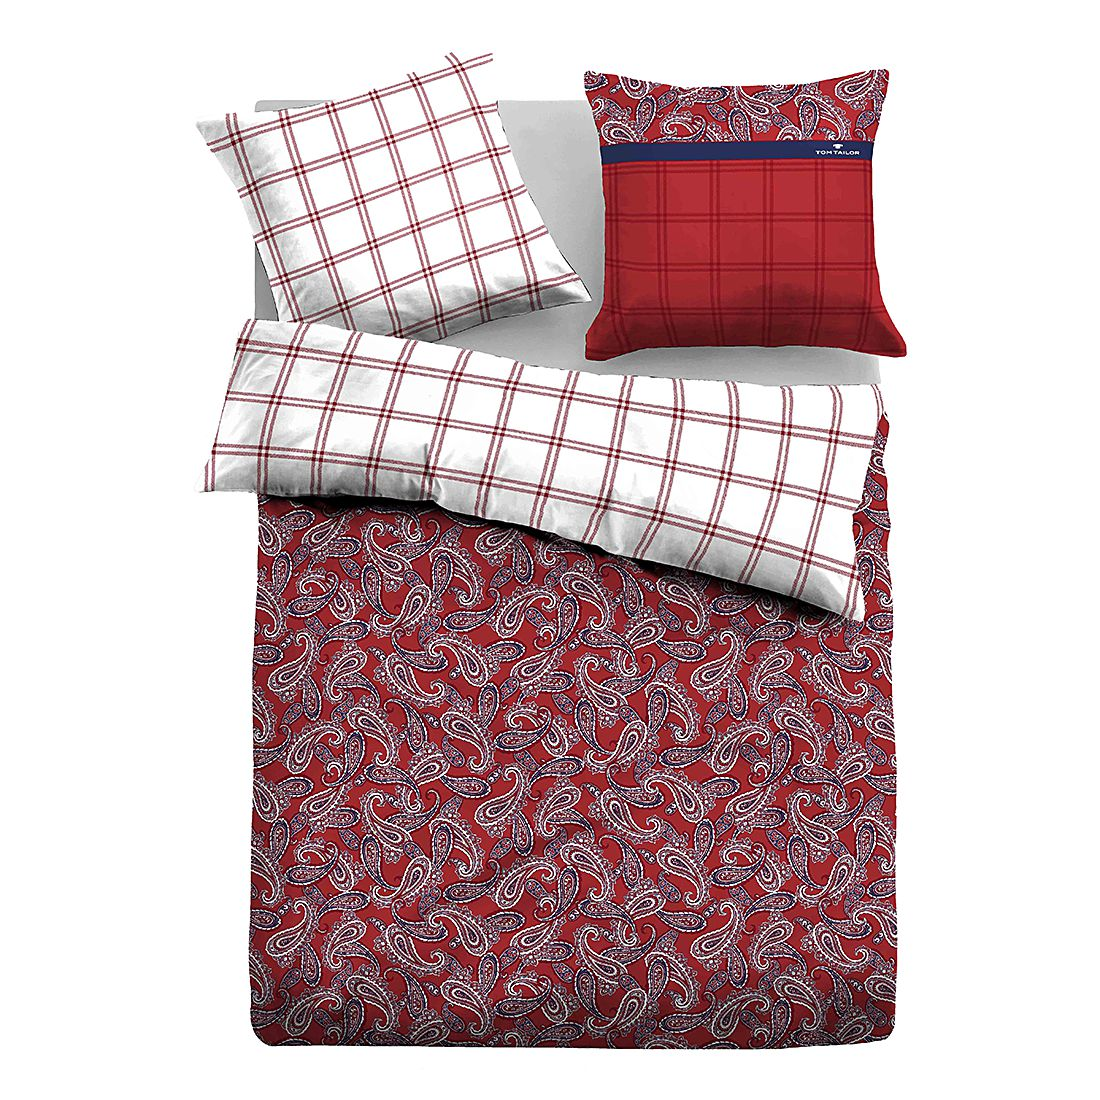 Satin Bettwäsche Paisley – Rot – 135 x 200 cm + Kissen 80 x 80 cm, Tom Tailor kaufen